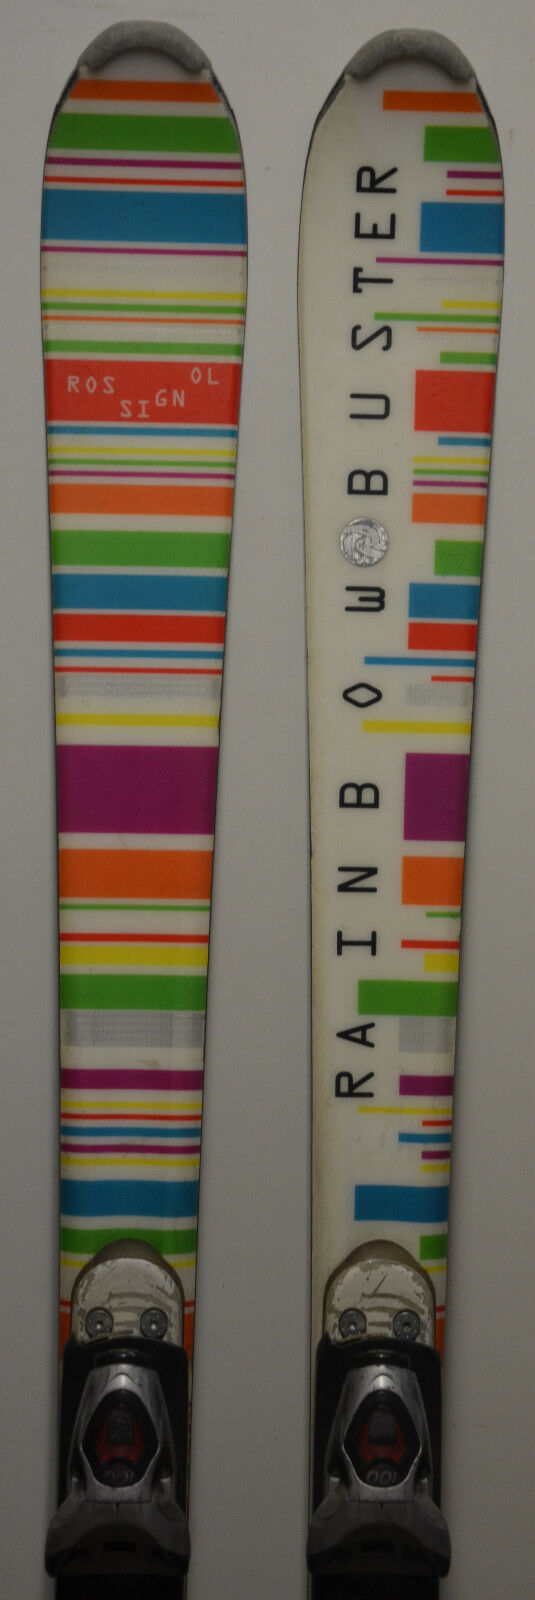 Esquí parabólico para mujeres rossinol arco iris Buster - 63 pulgadas.